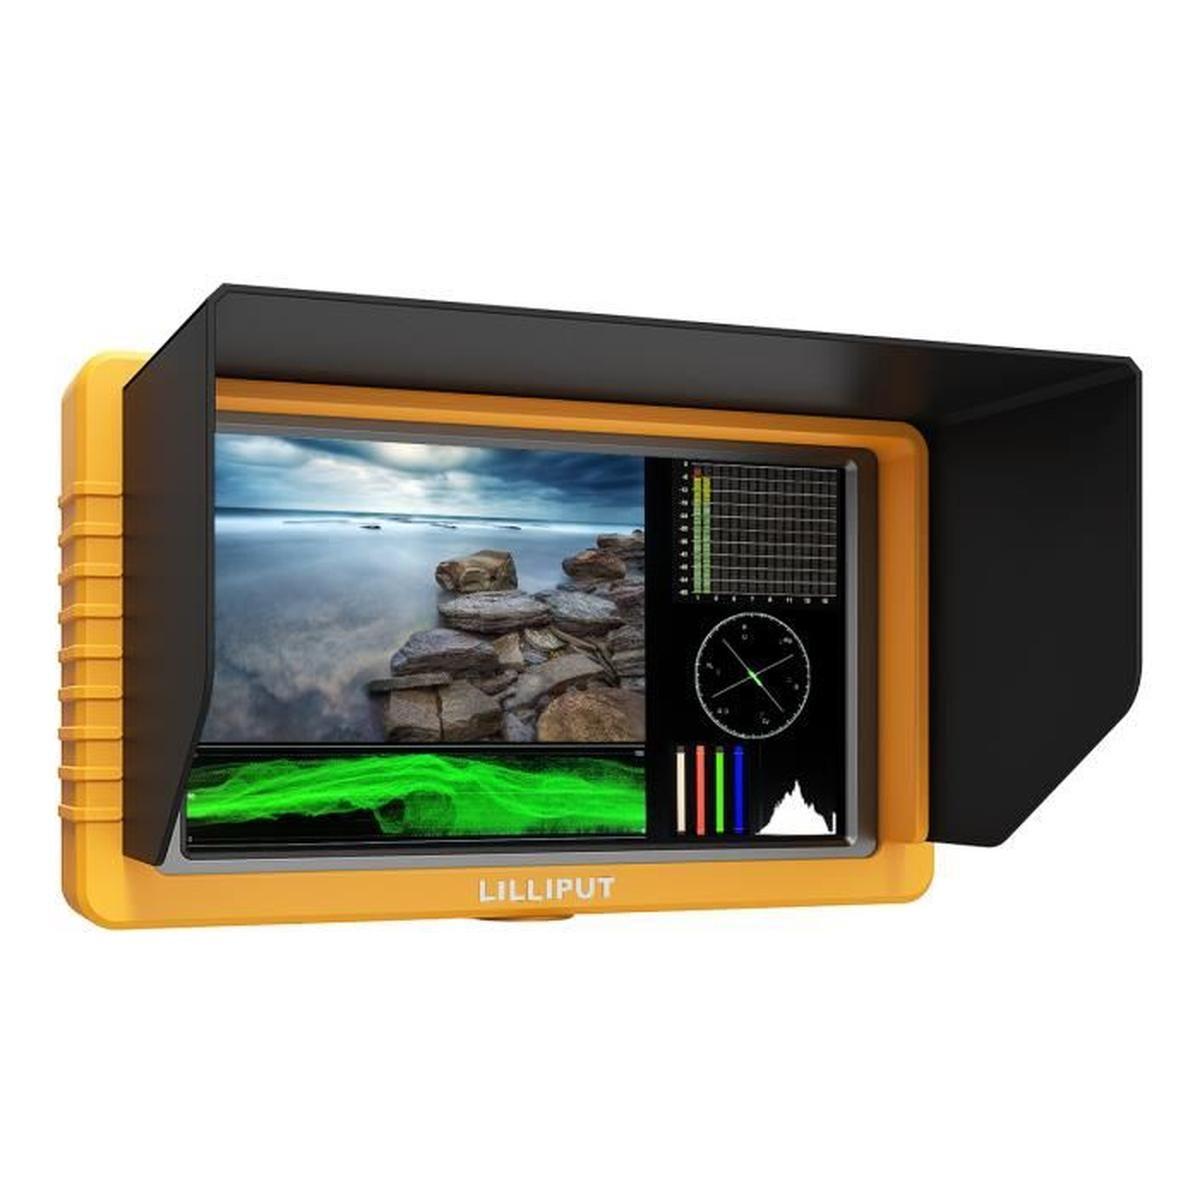 LILLIPUT Q5 MONITEUR HDMI/SDI 5''POUCES